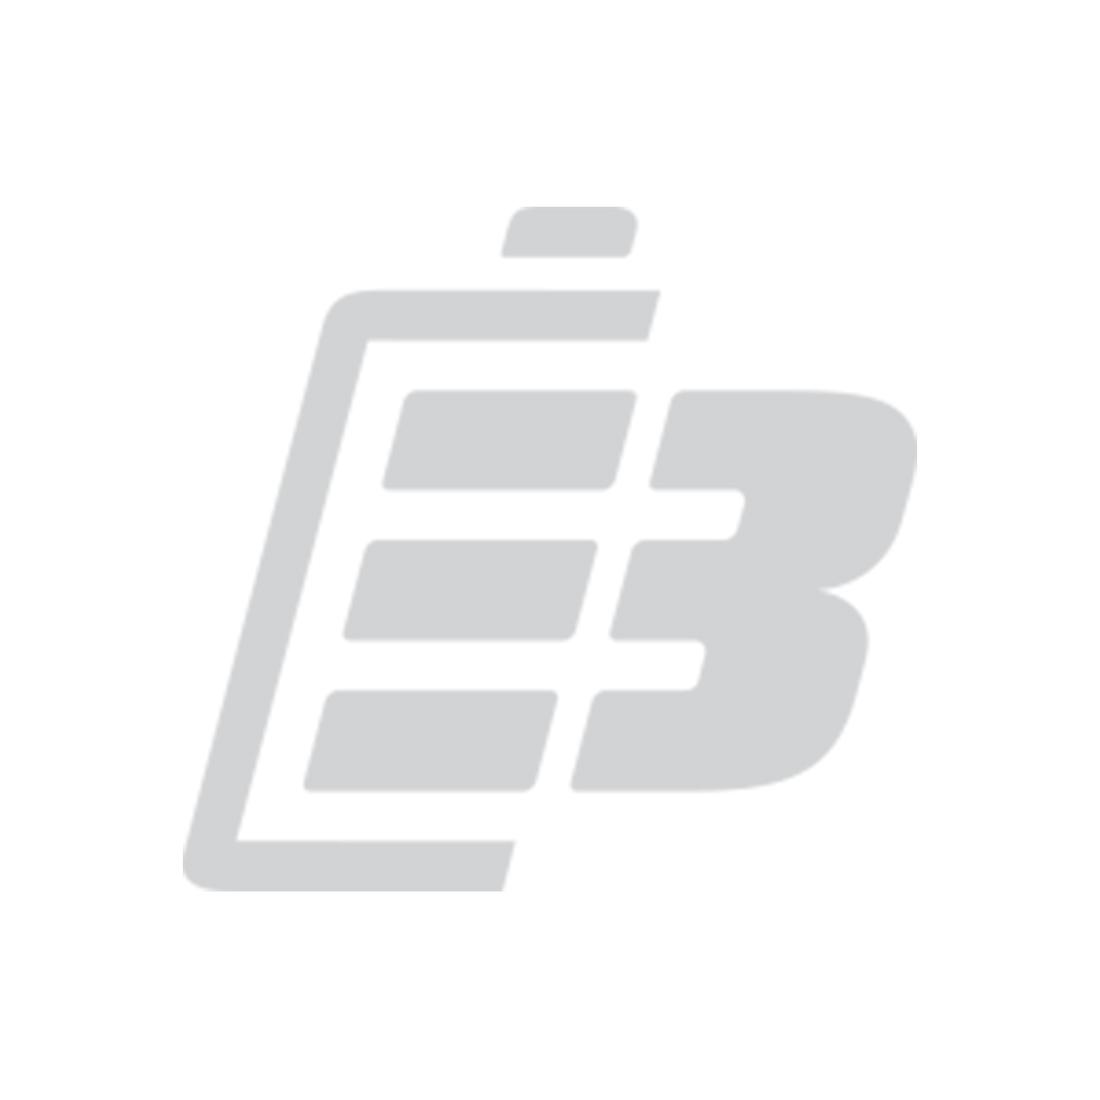 Laptop battery Toshiba Satellite S55_1